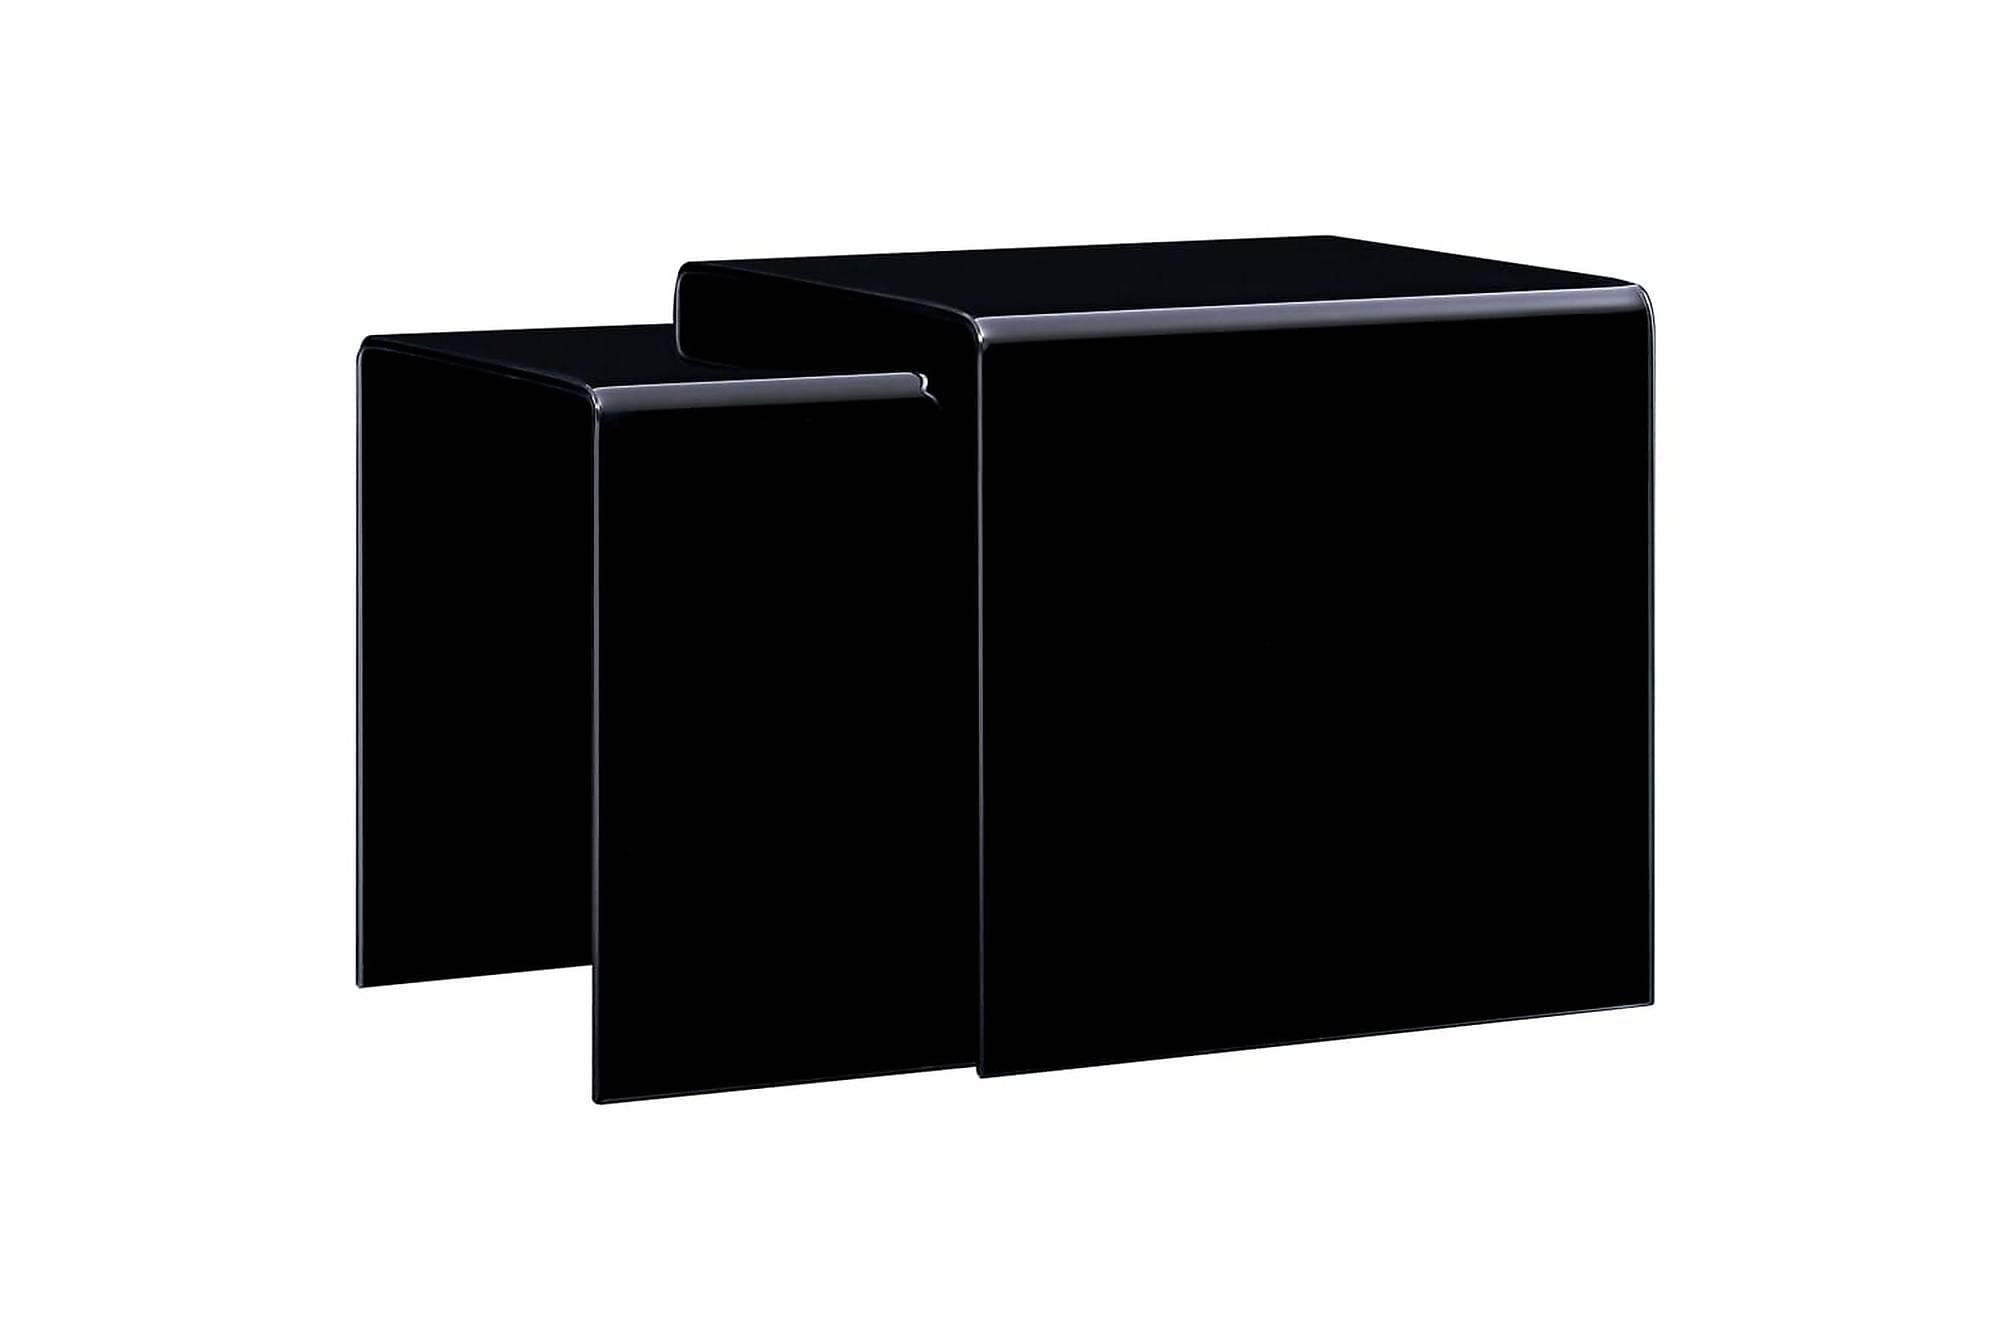 Satsbord 2 st svart 42x42x41,5 cm härdat glas